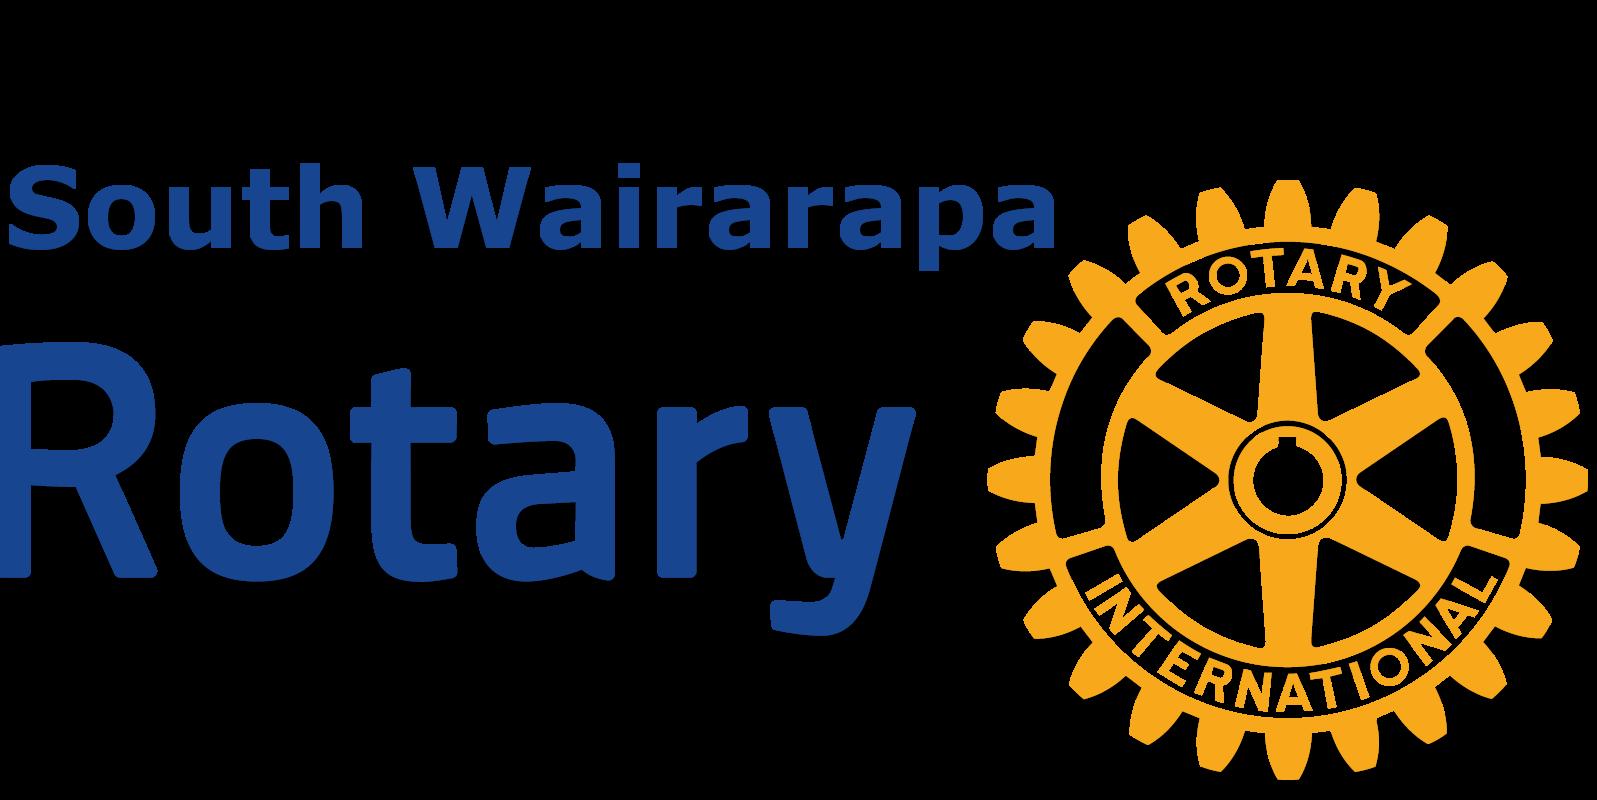 South Wairarapa Rotary